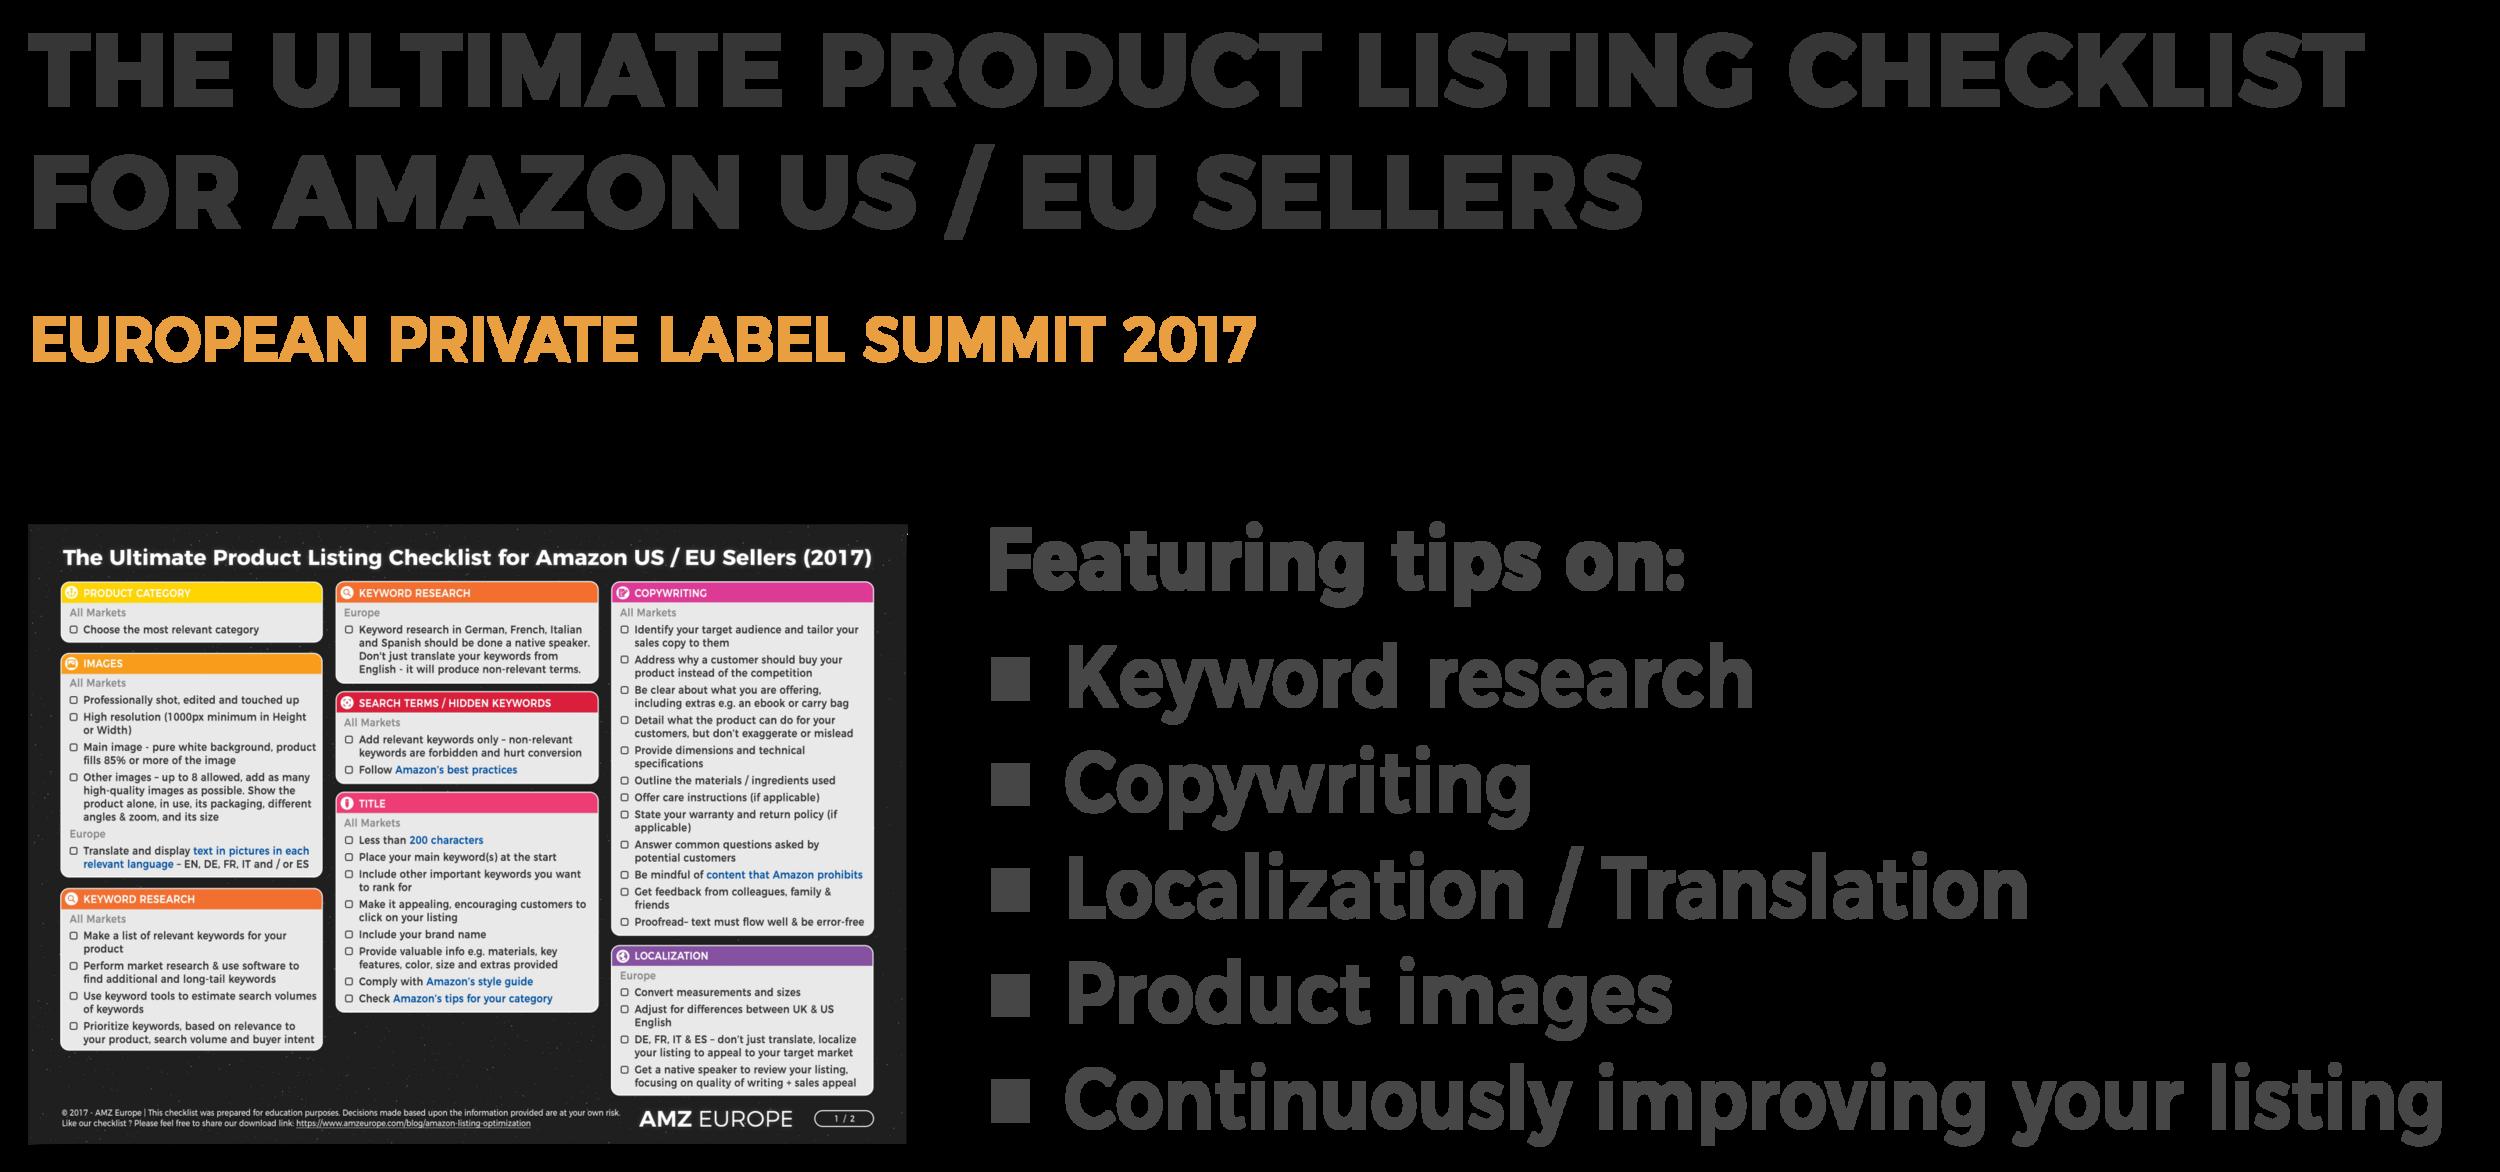 Amazon Europe Listings - Optimization Checklist - European Private Label Summit 2017